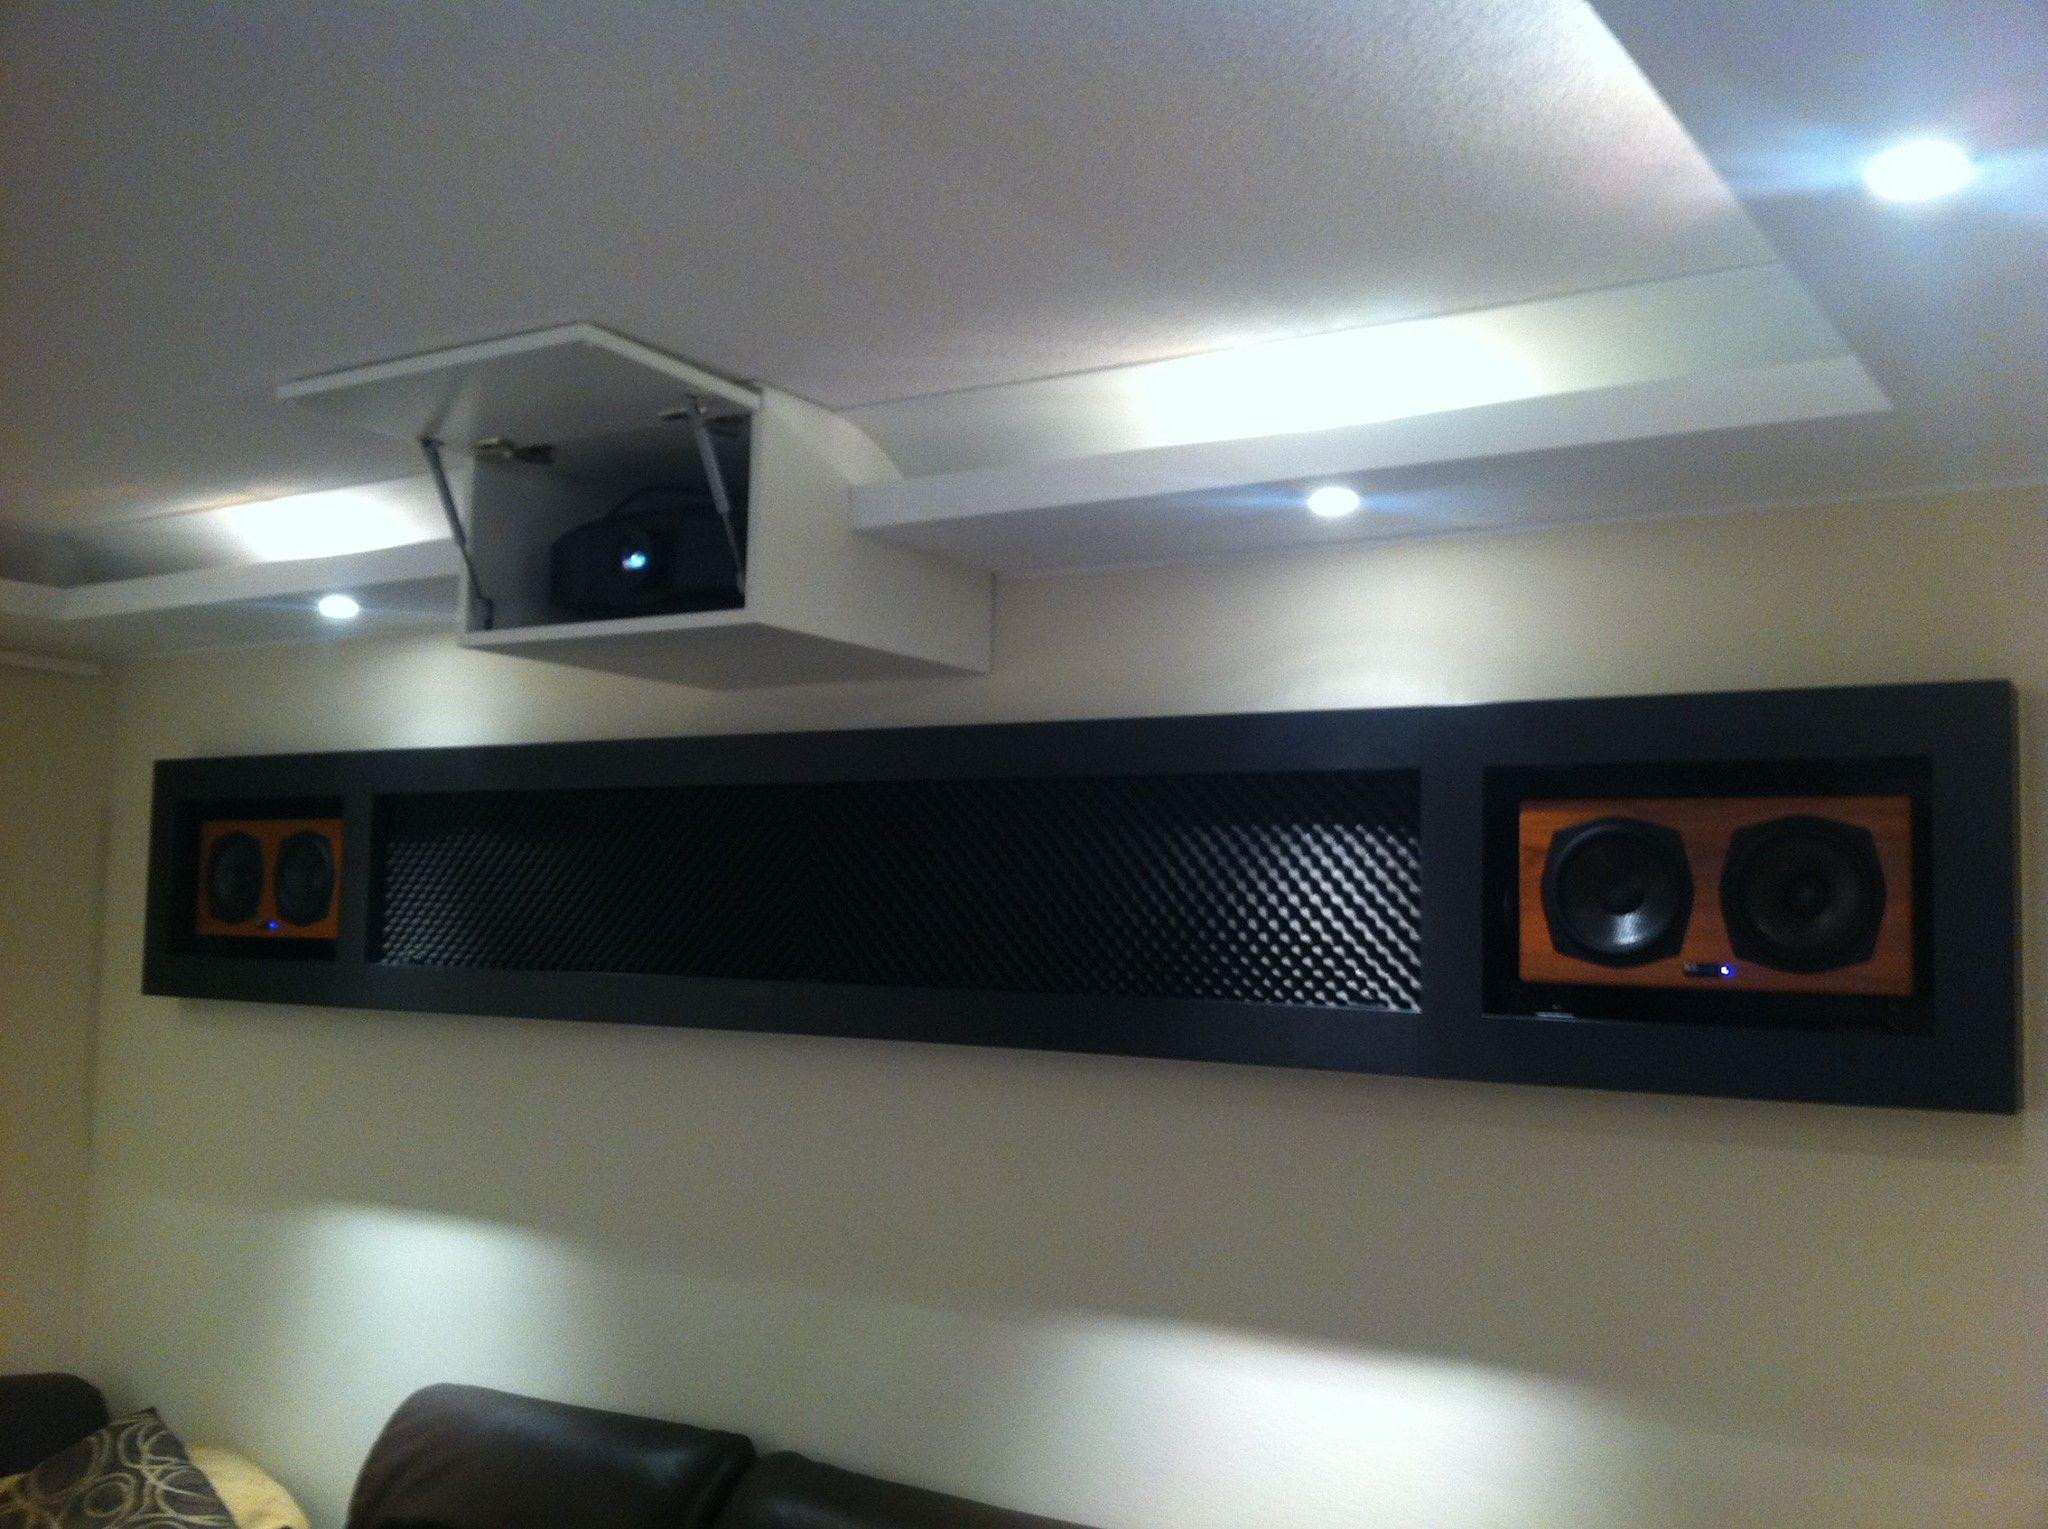 beamer lautsprecher im heimkino pinterest beamer heimkino und lautsprecher. Black Bedroom Furniture Sets. Home Design Ideas